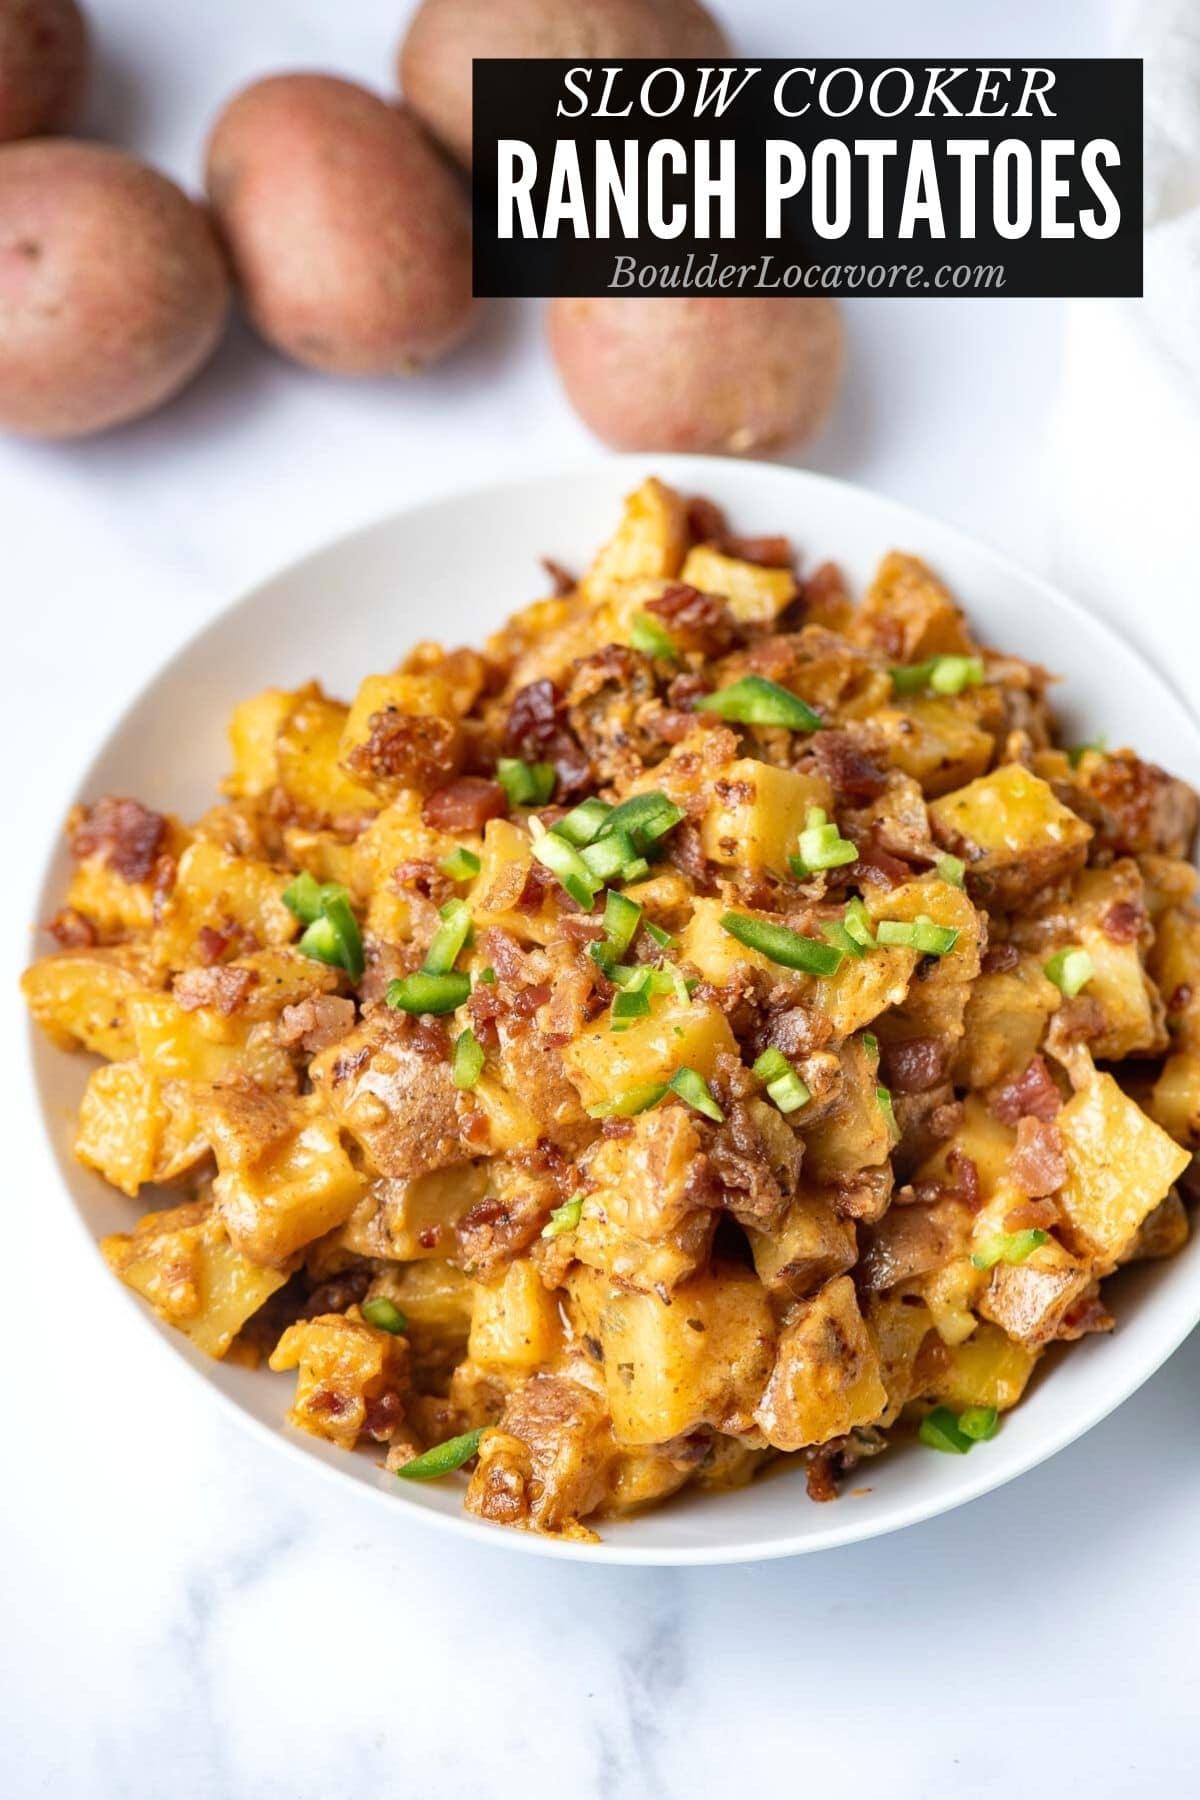 Ranch Potatoes title image